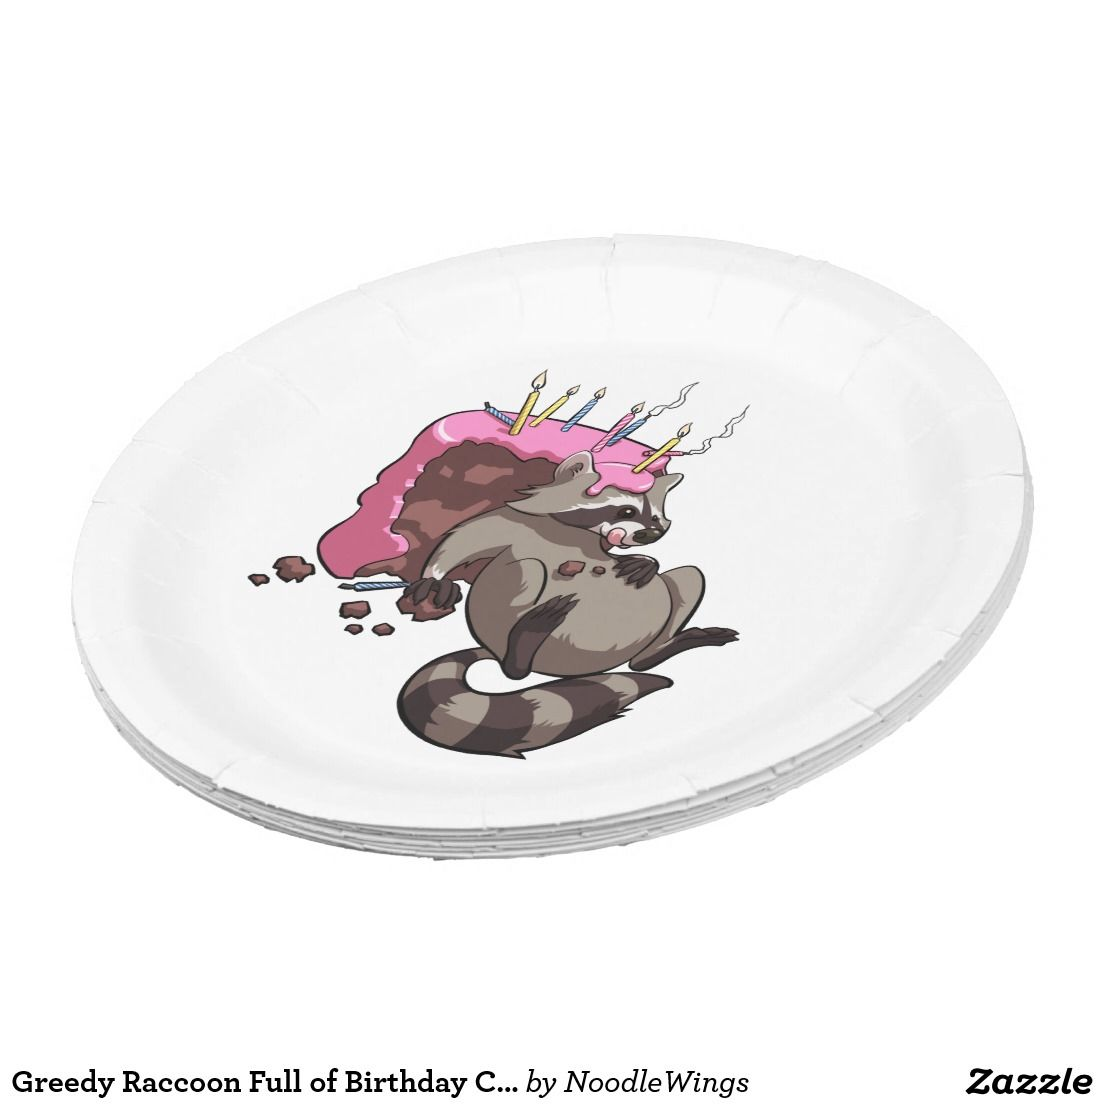 Greedy Raccoon Full of Birthday Cake Cartoon